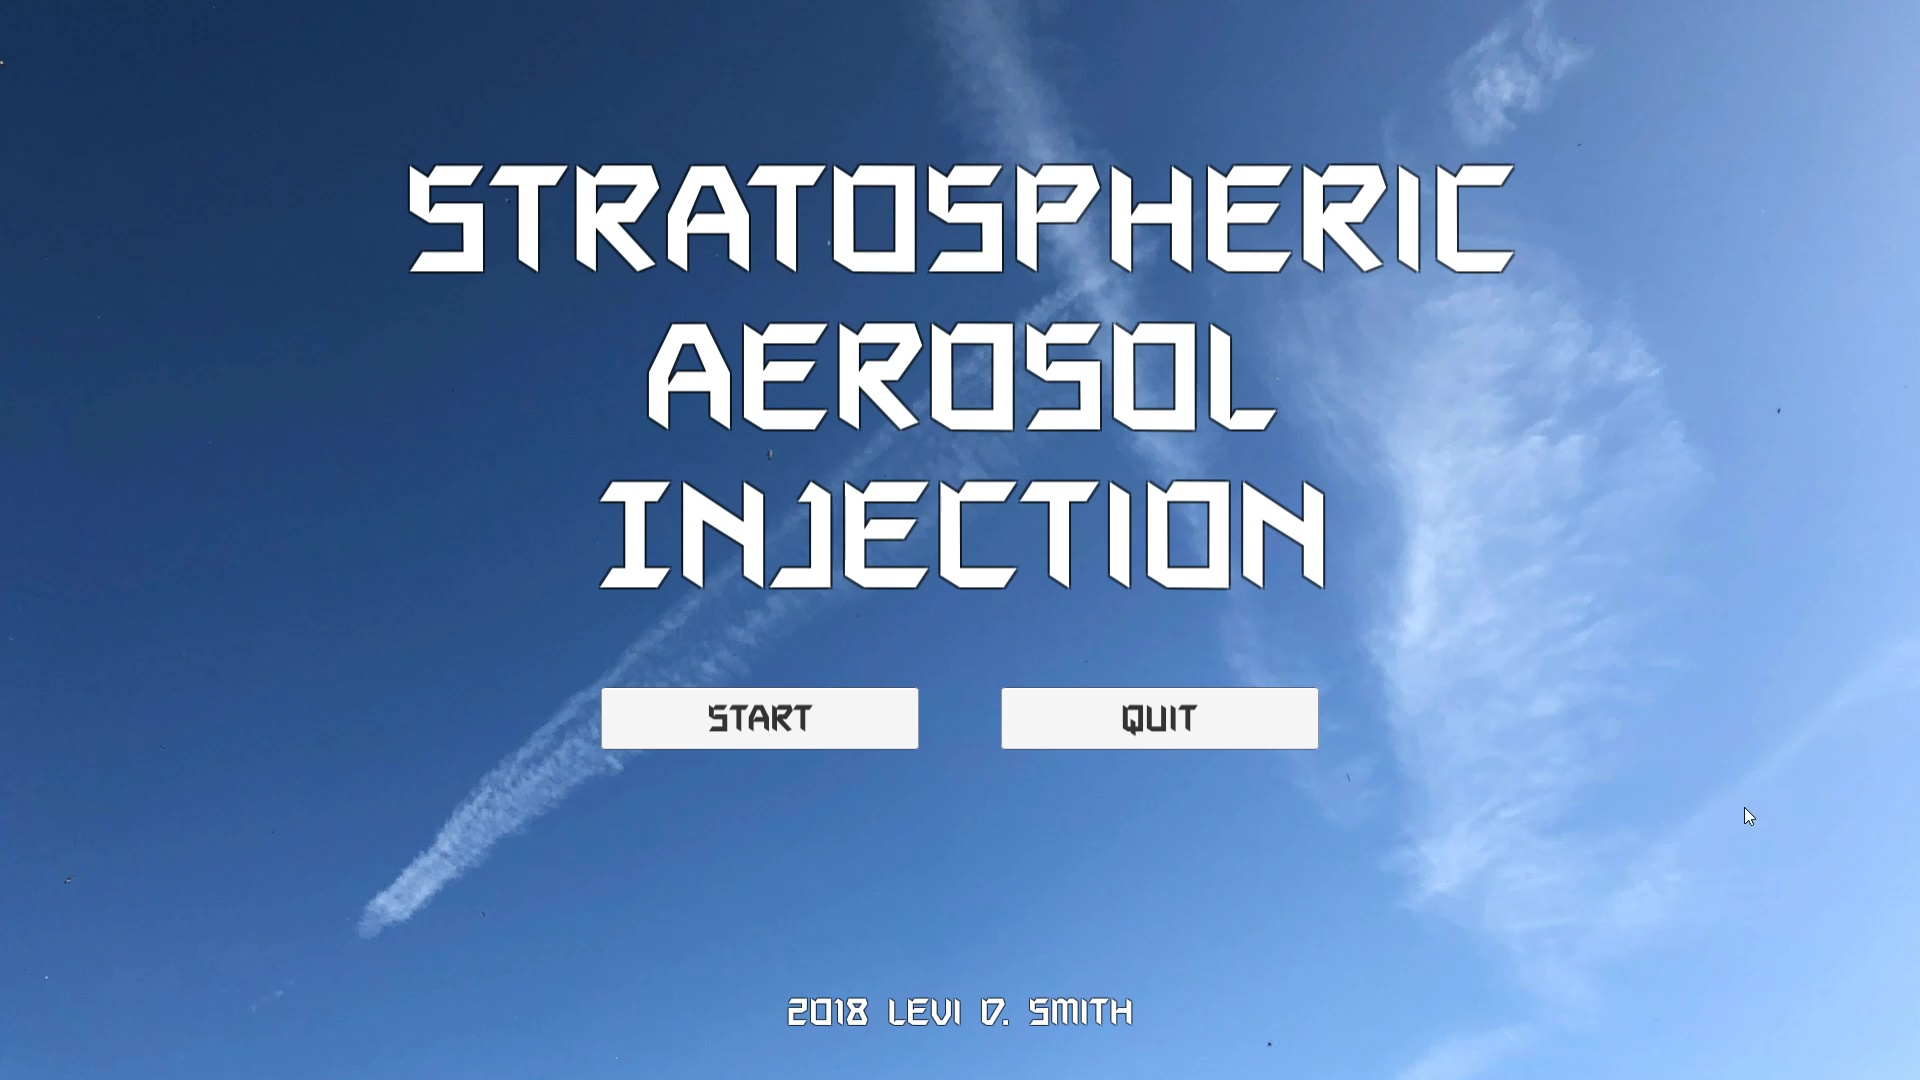 Stratospheric Aerosol Injection